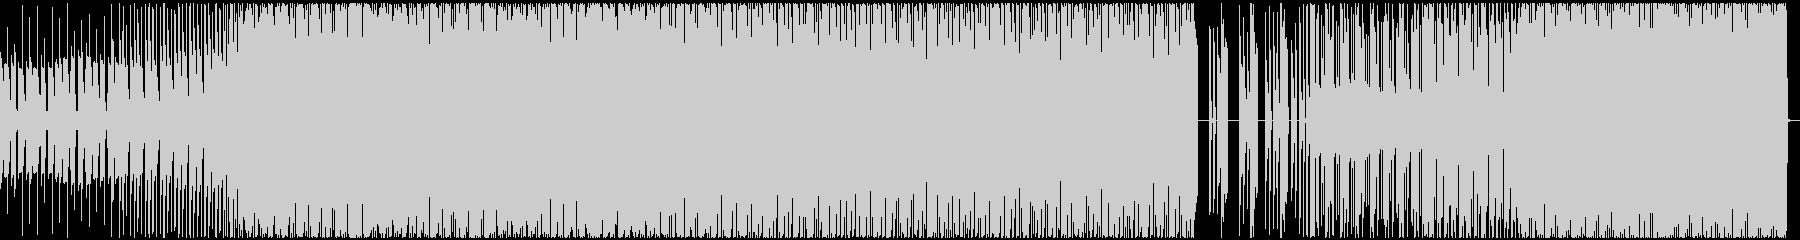 3xoscというシンセを用いたテクノの未再生の波形